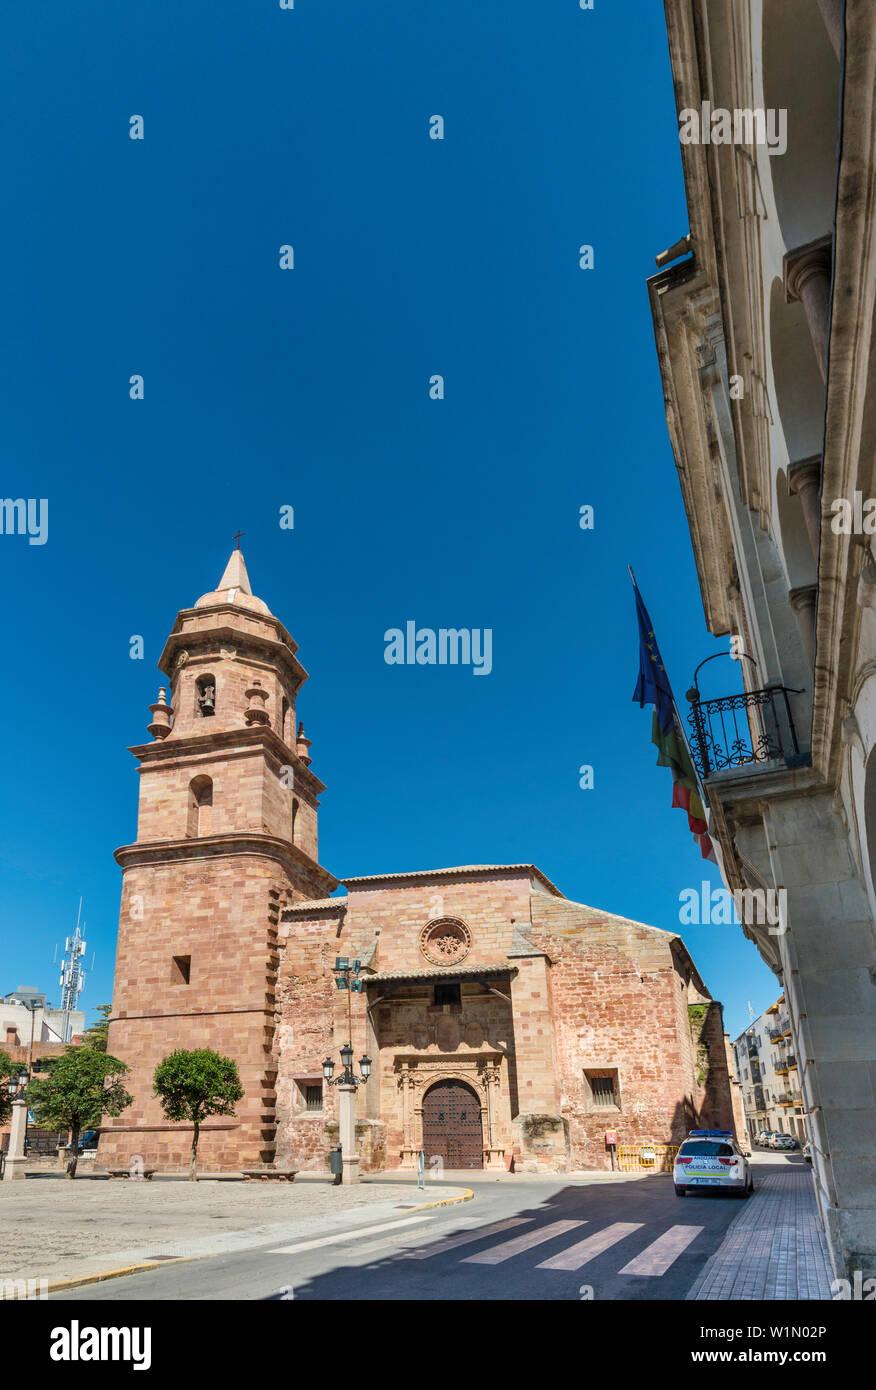 Iglesia de San Miguel Arcangel, at Plaza de España in Andujar, Jaen province, Andalusia, Spain - Stock Image